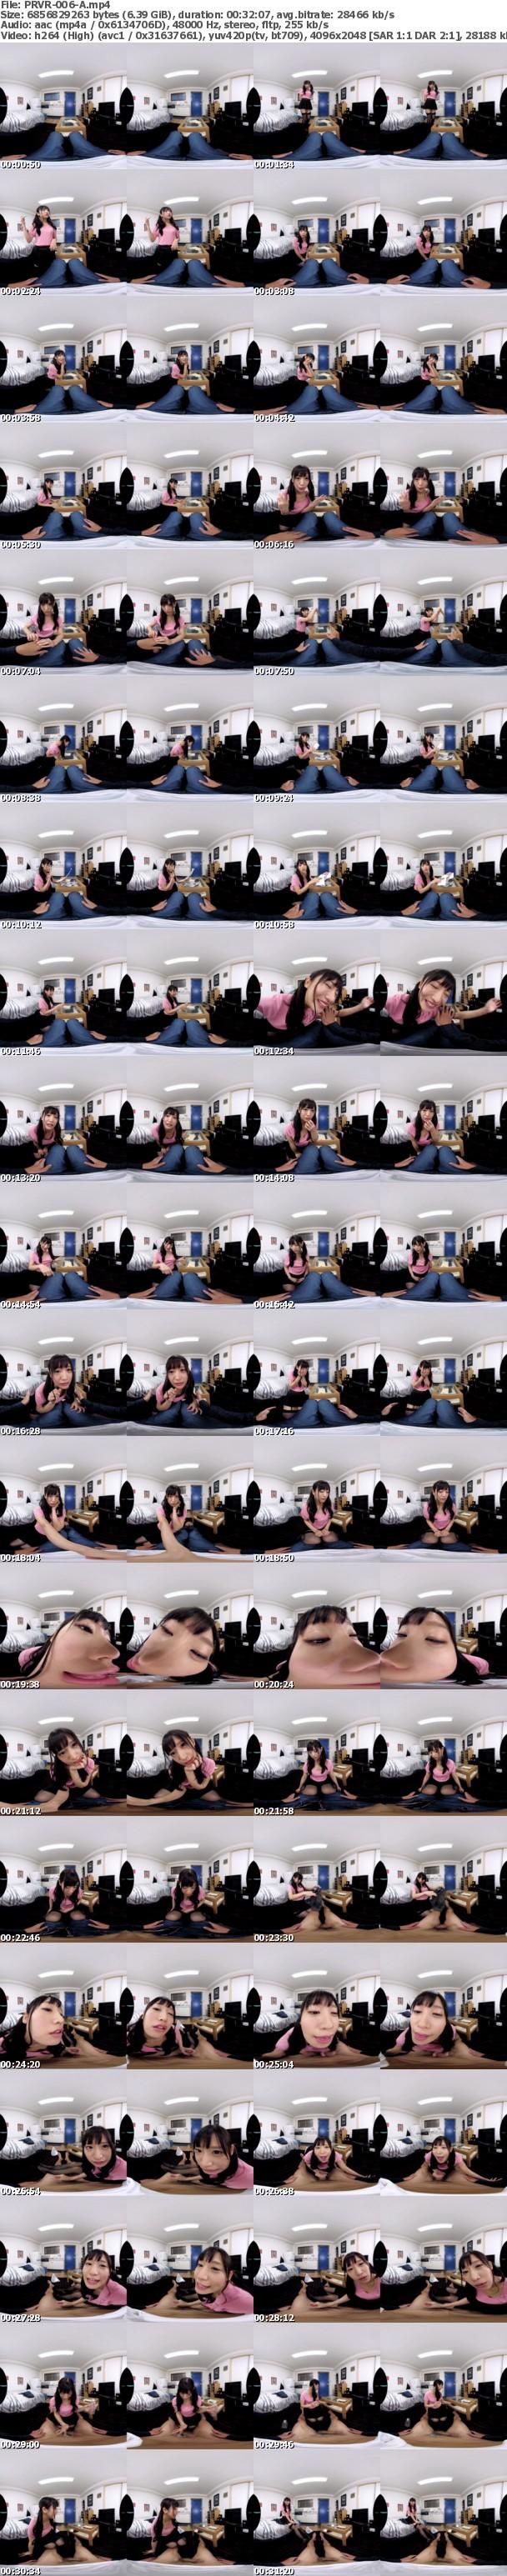 (VR) PRVR-006 【HQ超高画質】もしもアナタのストーカーが美人でエロテク凄い後輩ちゃんだったら…! 囁きポジションで惑わせる淫語連発!メンヘラ美脚ニーハイ履いて激しい騎乗位!中出ししたら絶対ヤバいのに…ッ! 星奈あい